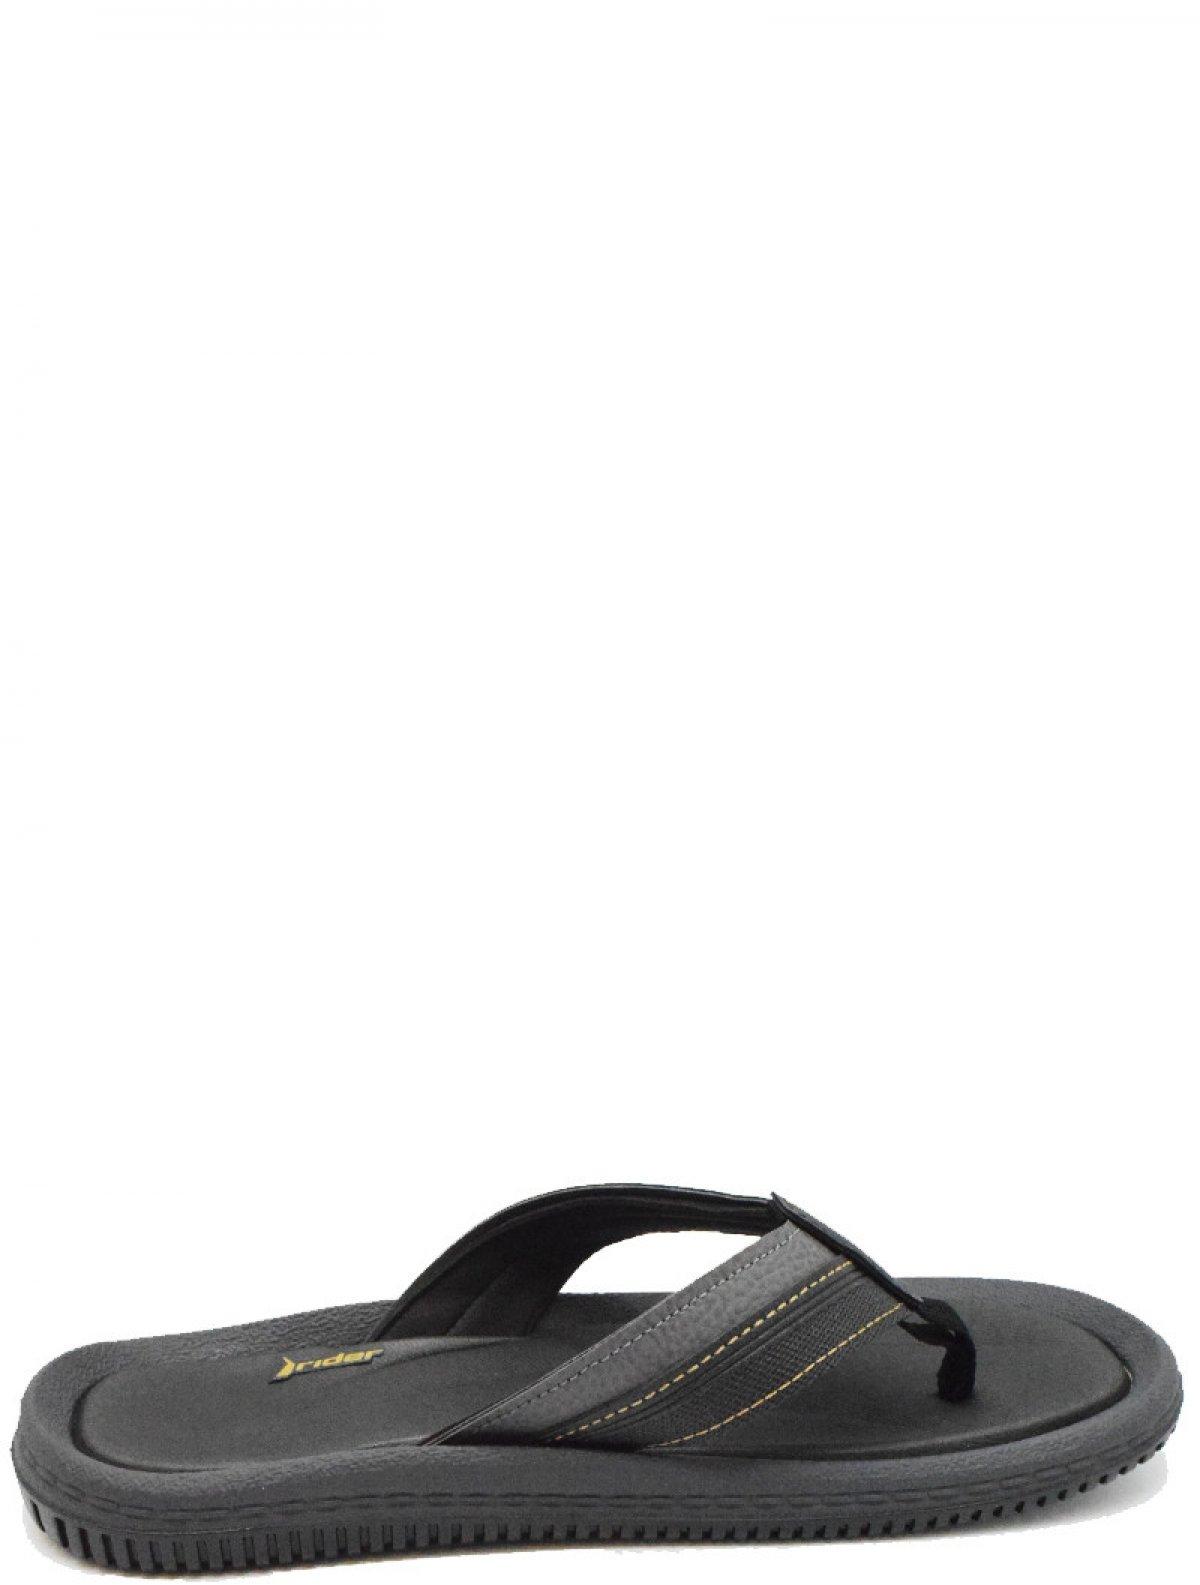 RIDER 82243-24502 мужские пантолеты